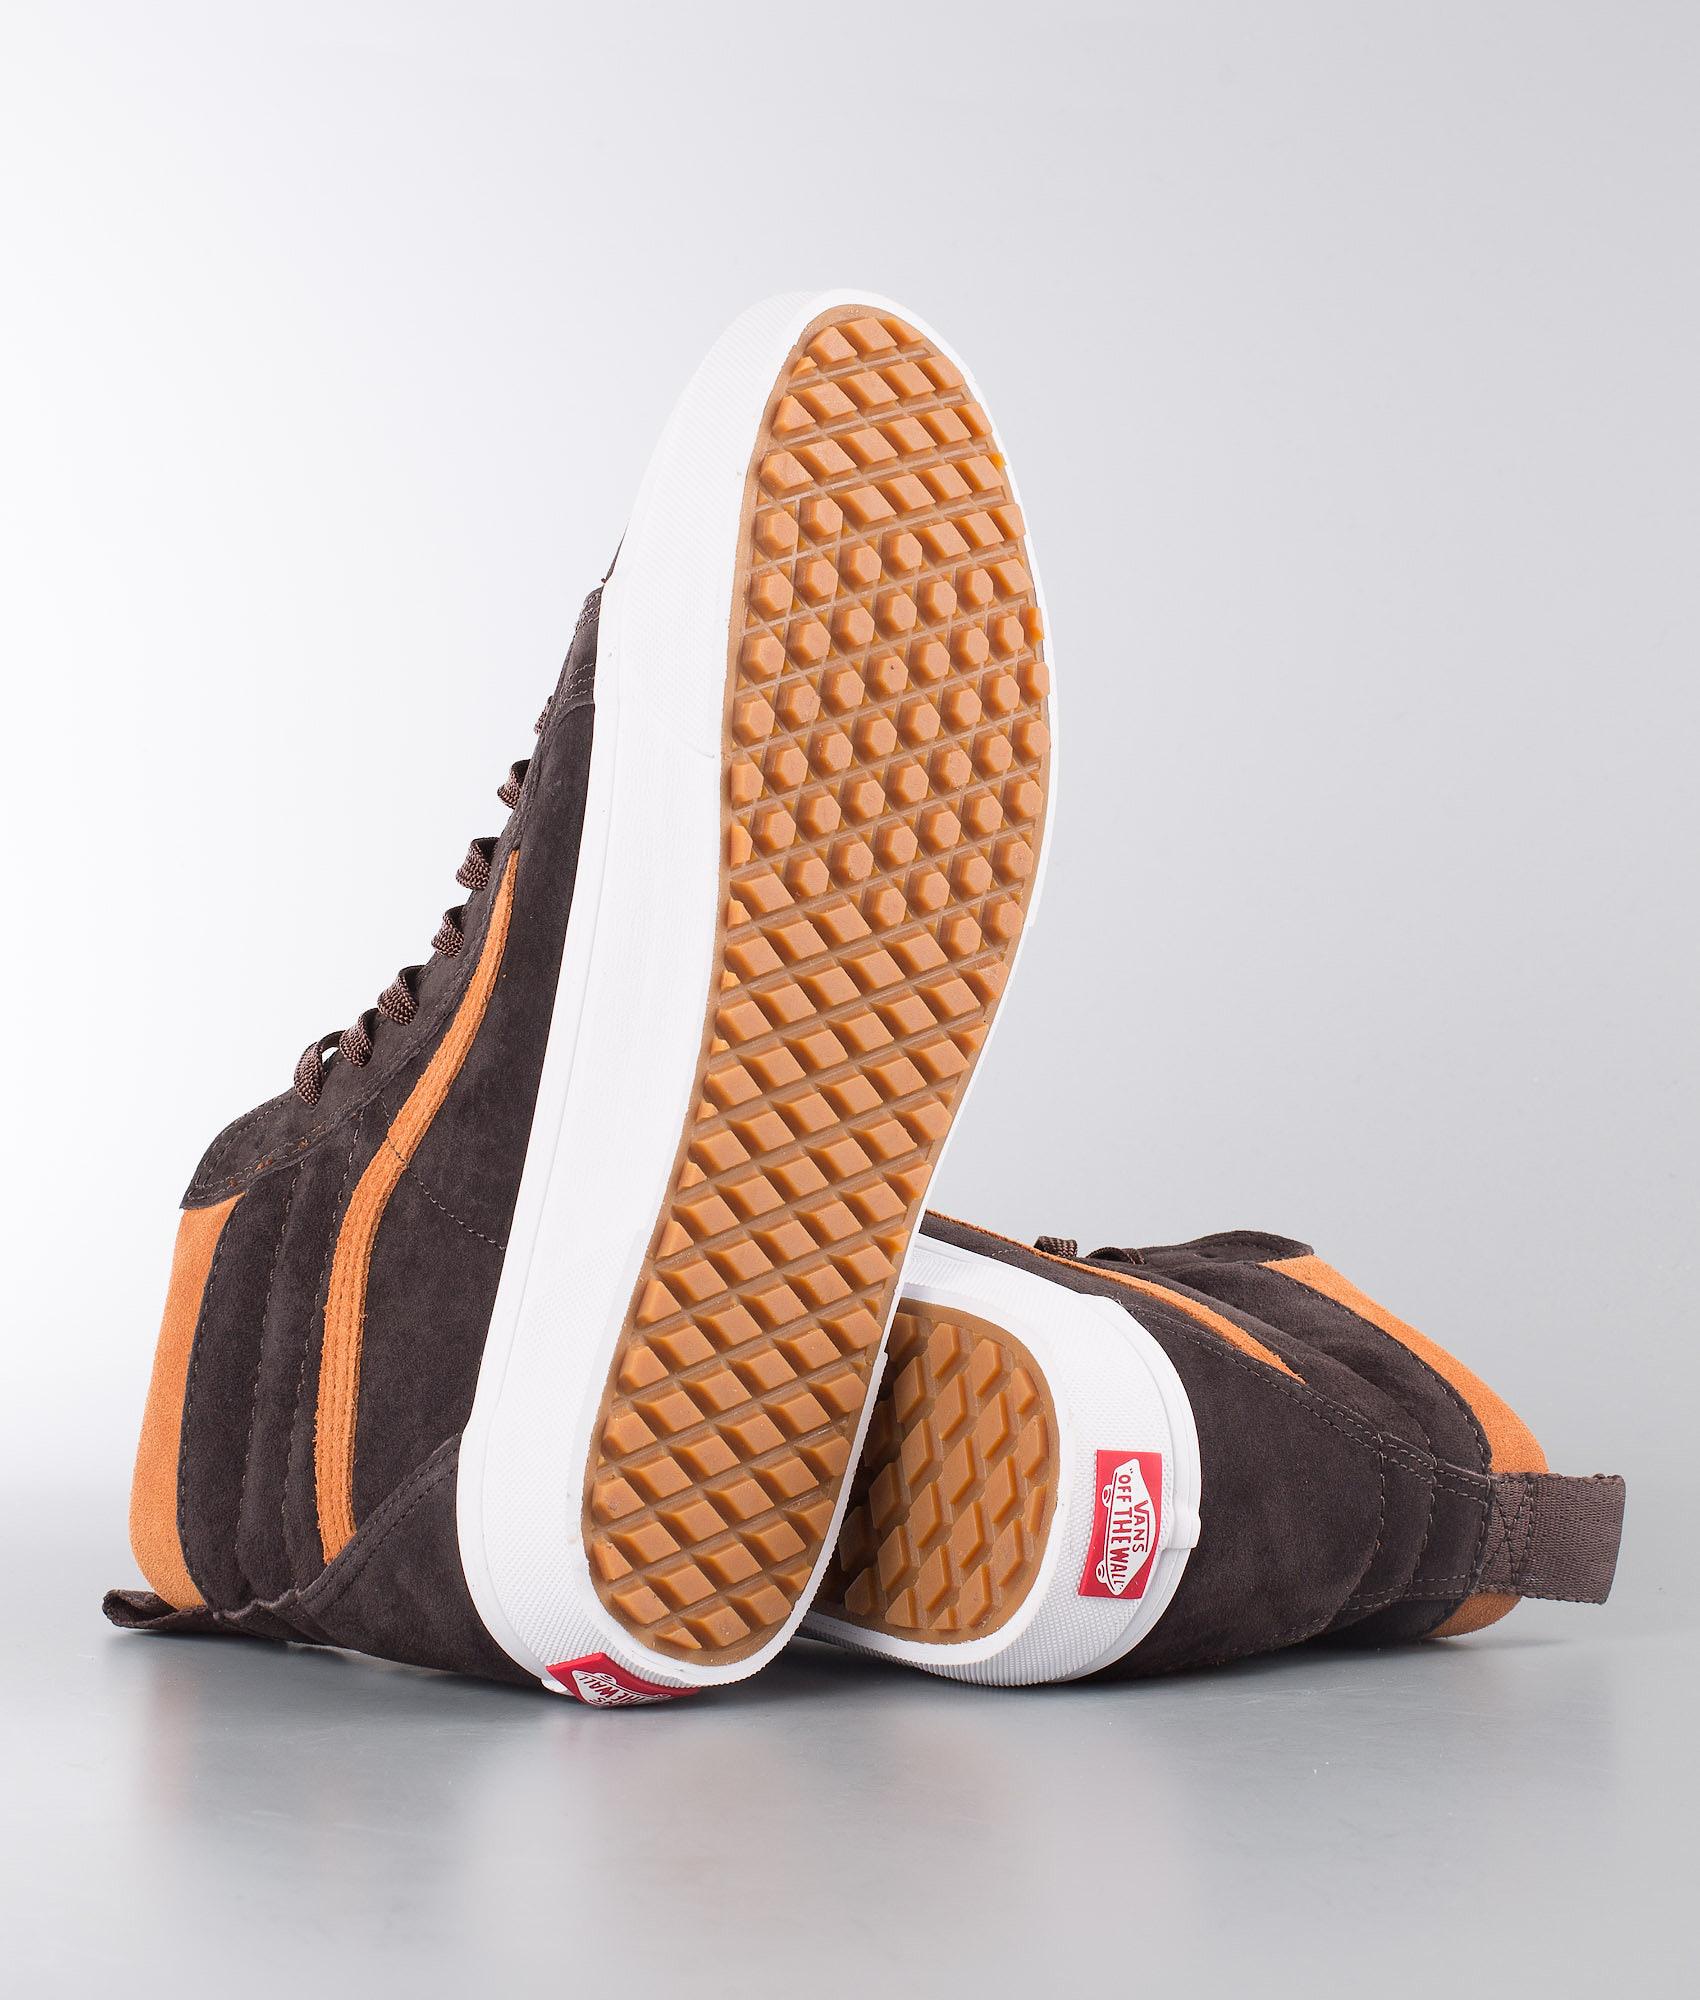 650d4fe0cd19de Vans Sk8-Hi Mte Shoes (Mte) Suede Chocolate Torte - Ridestore.com